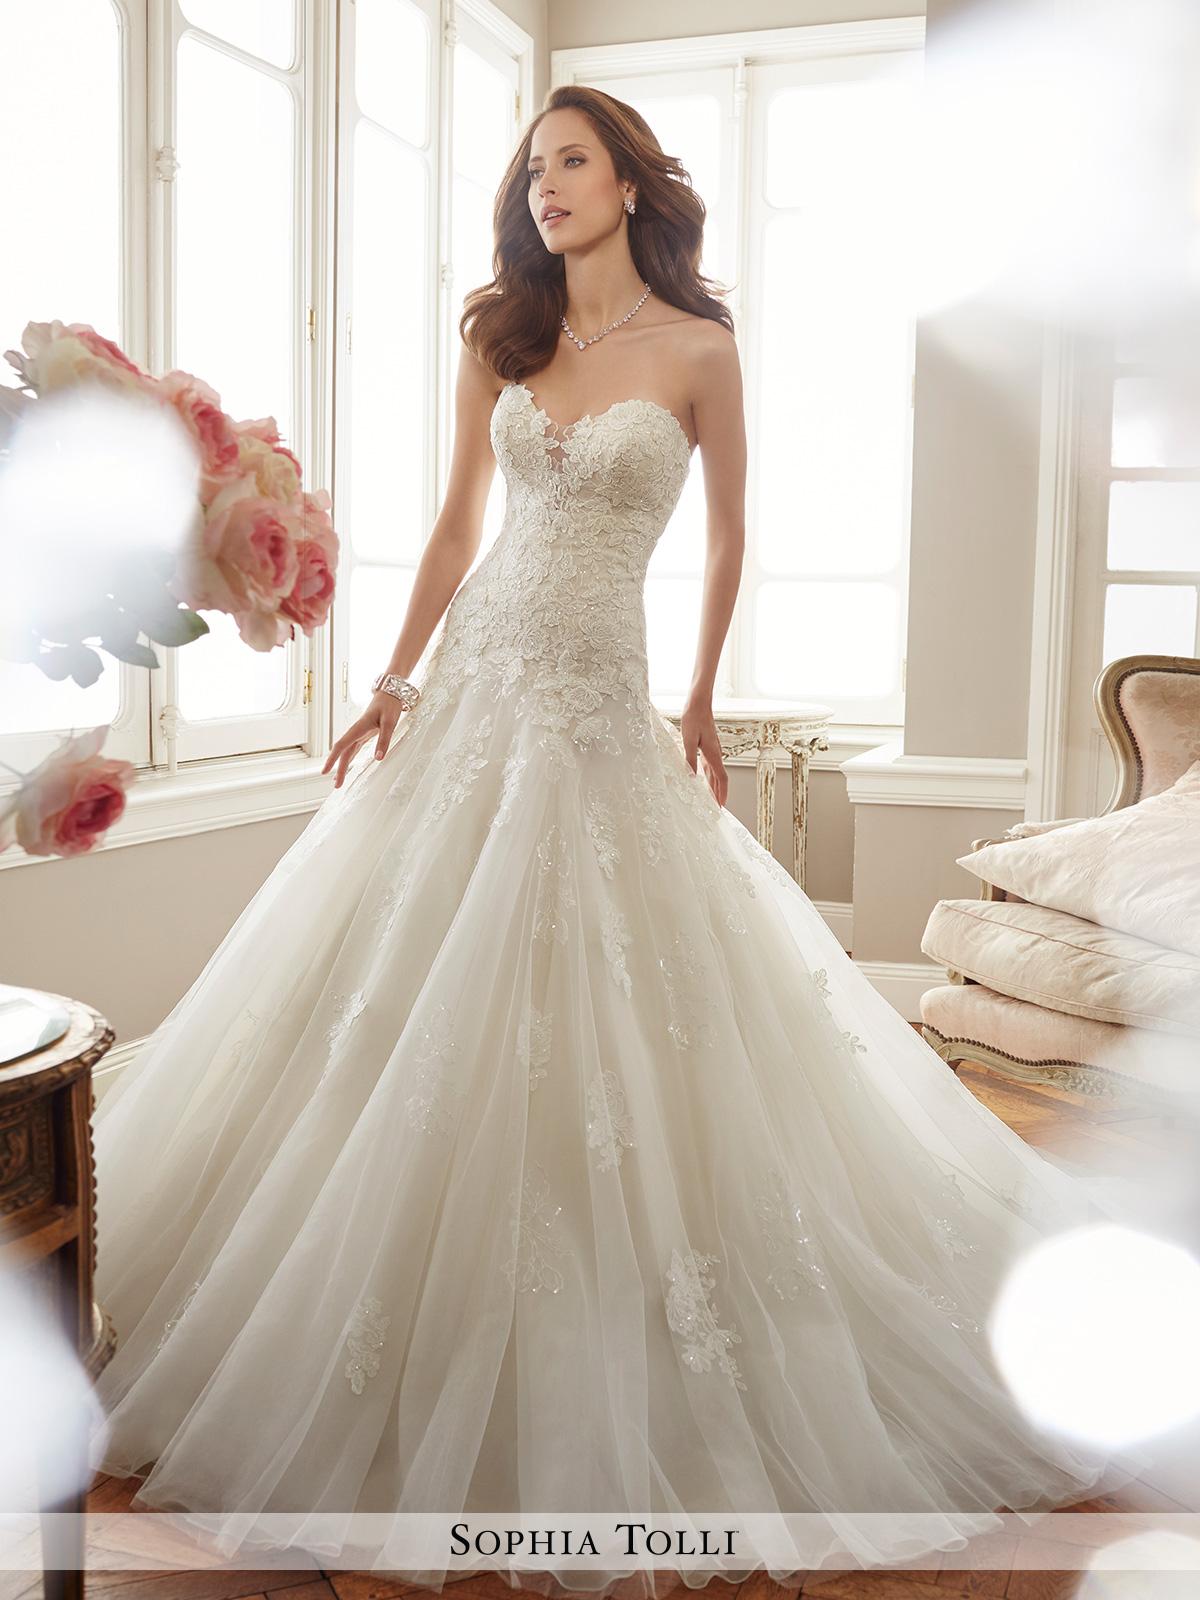 Dress Sophia Tolli Spring 2017 Collection Y11715 Deon Sophiatollibymoncheri Bridal